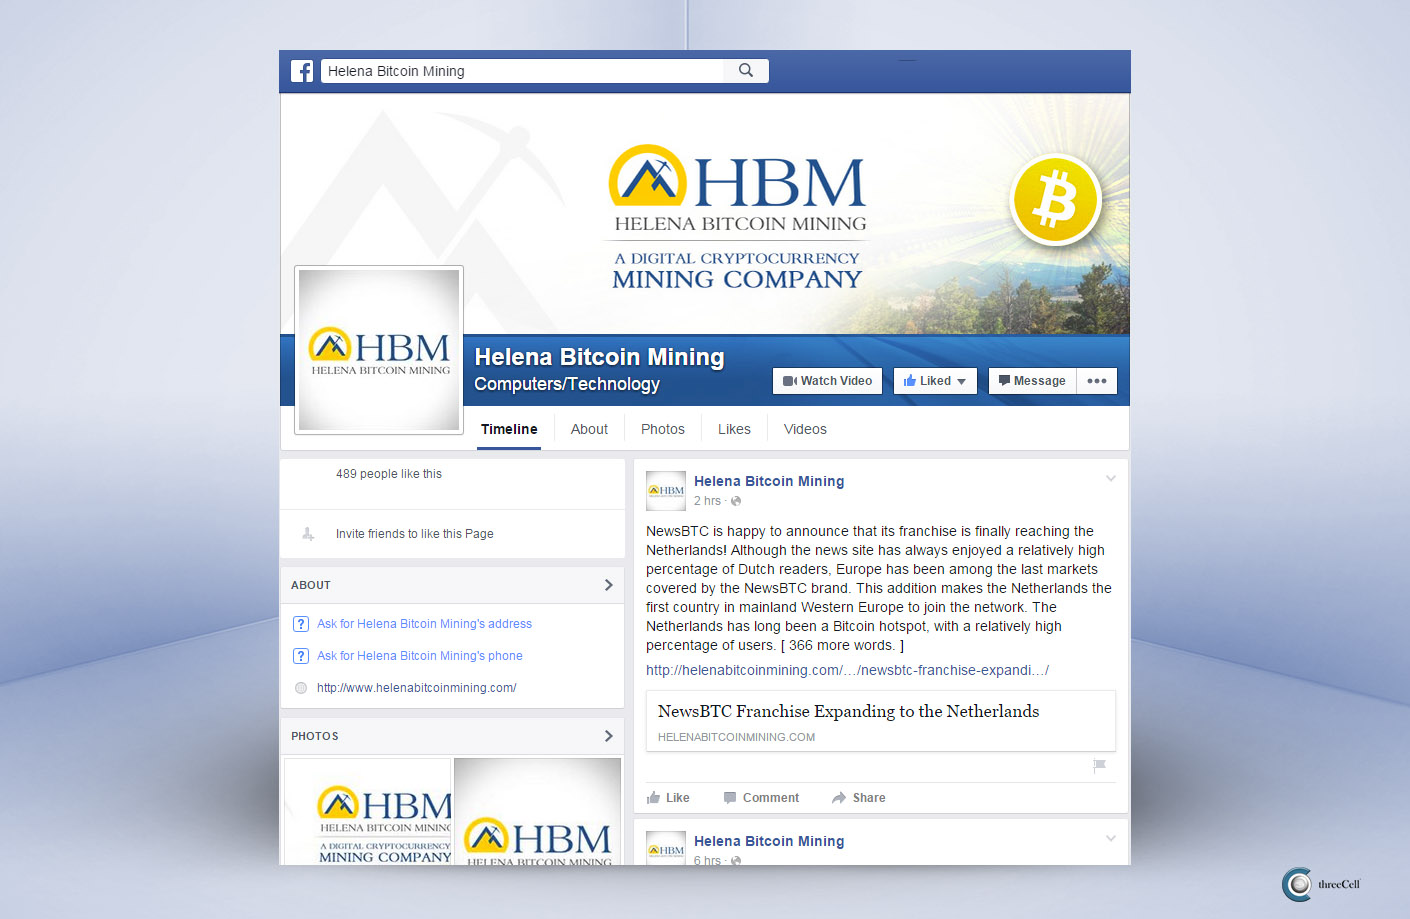 Helena Bitcoin Mining - Facebook Social Media Design